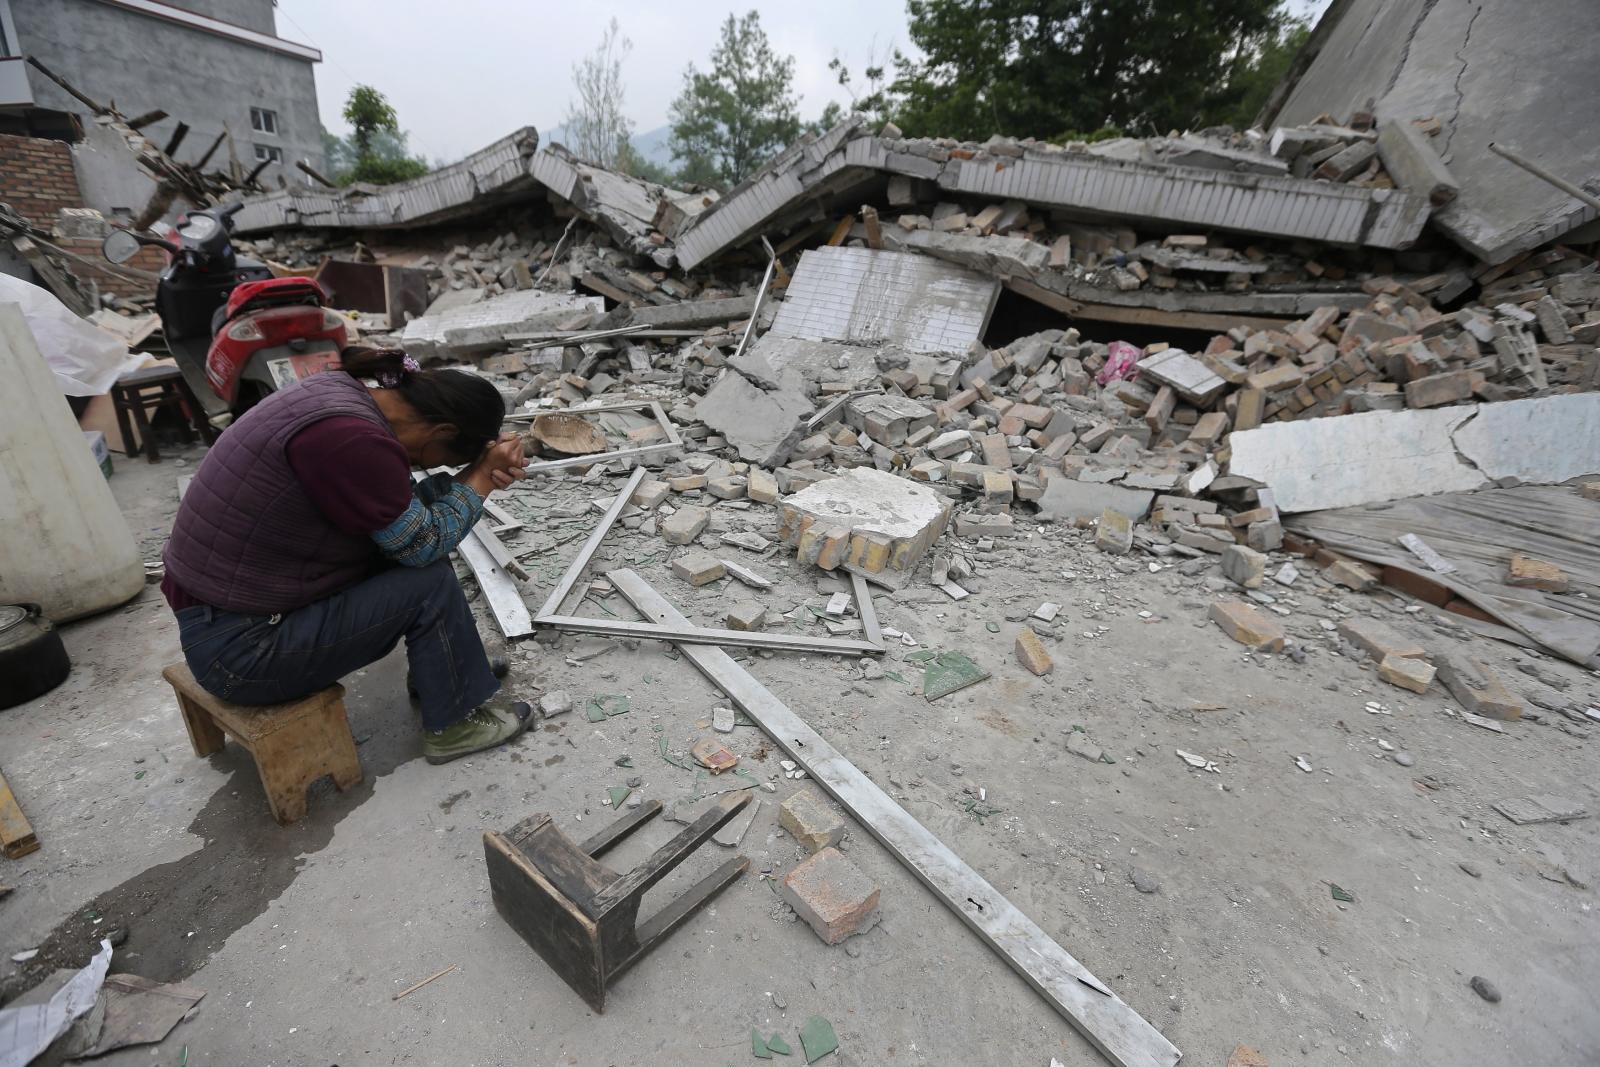 Sichuan 2008 earthquake china